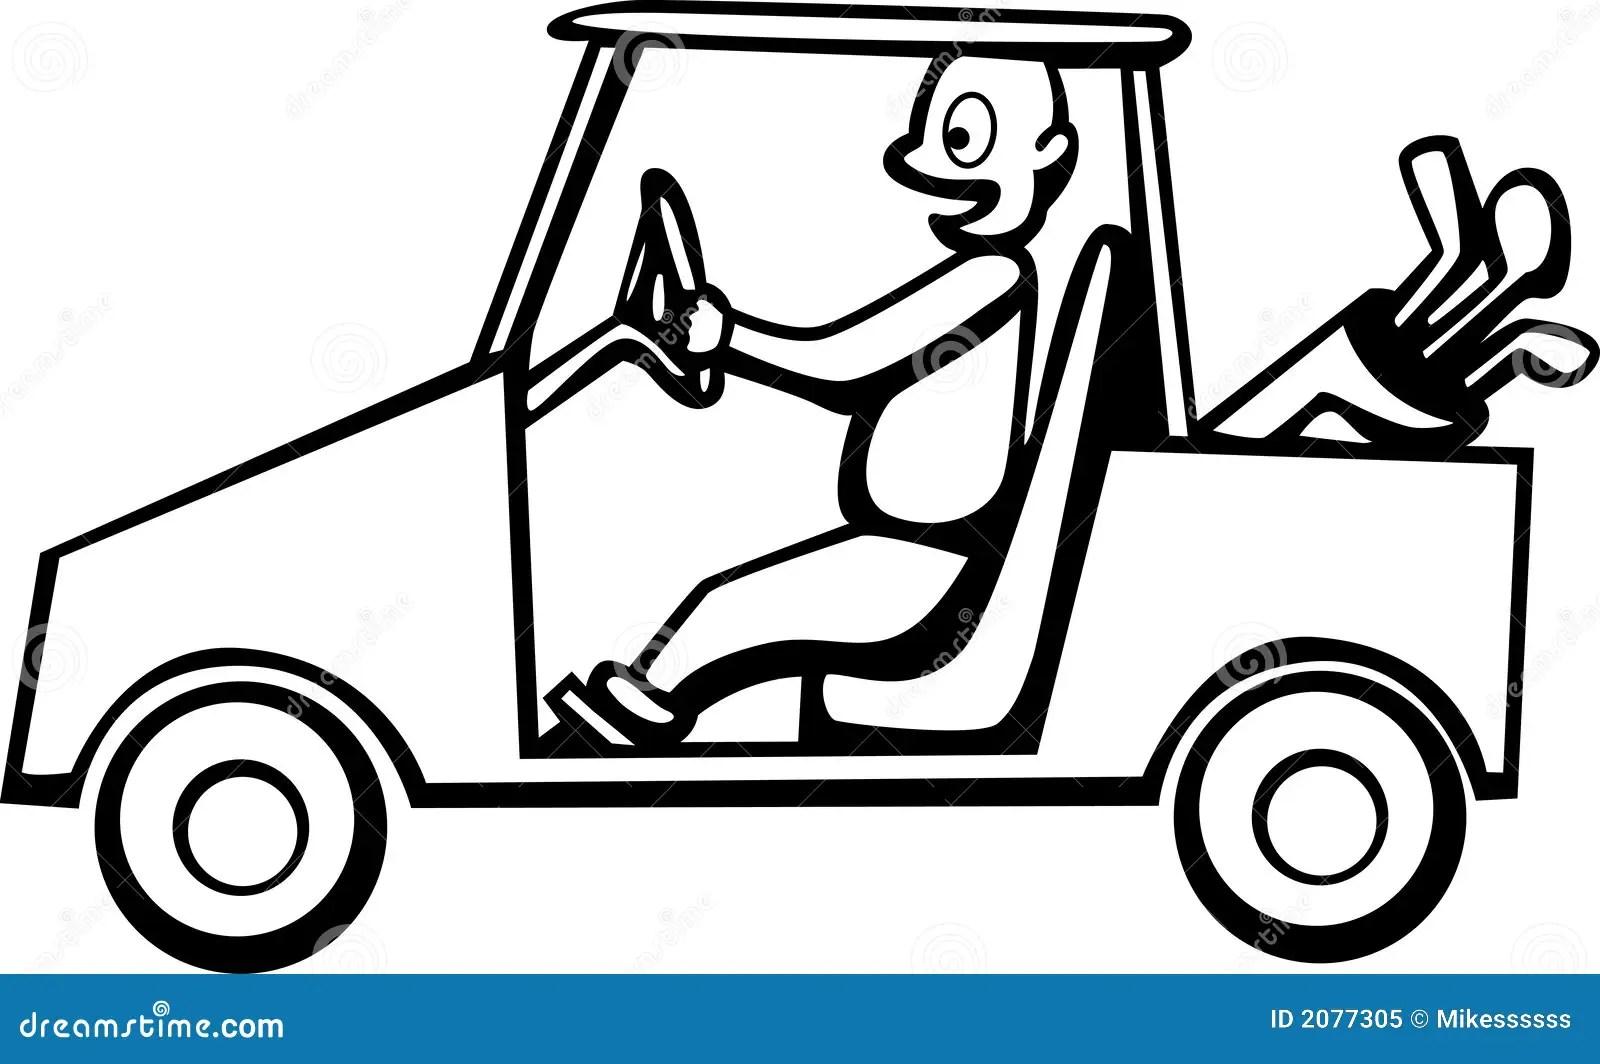 Golfer Driving A Golf Cart Vector Illustration Royalty